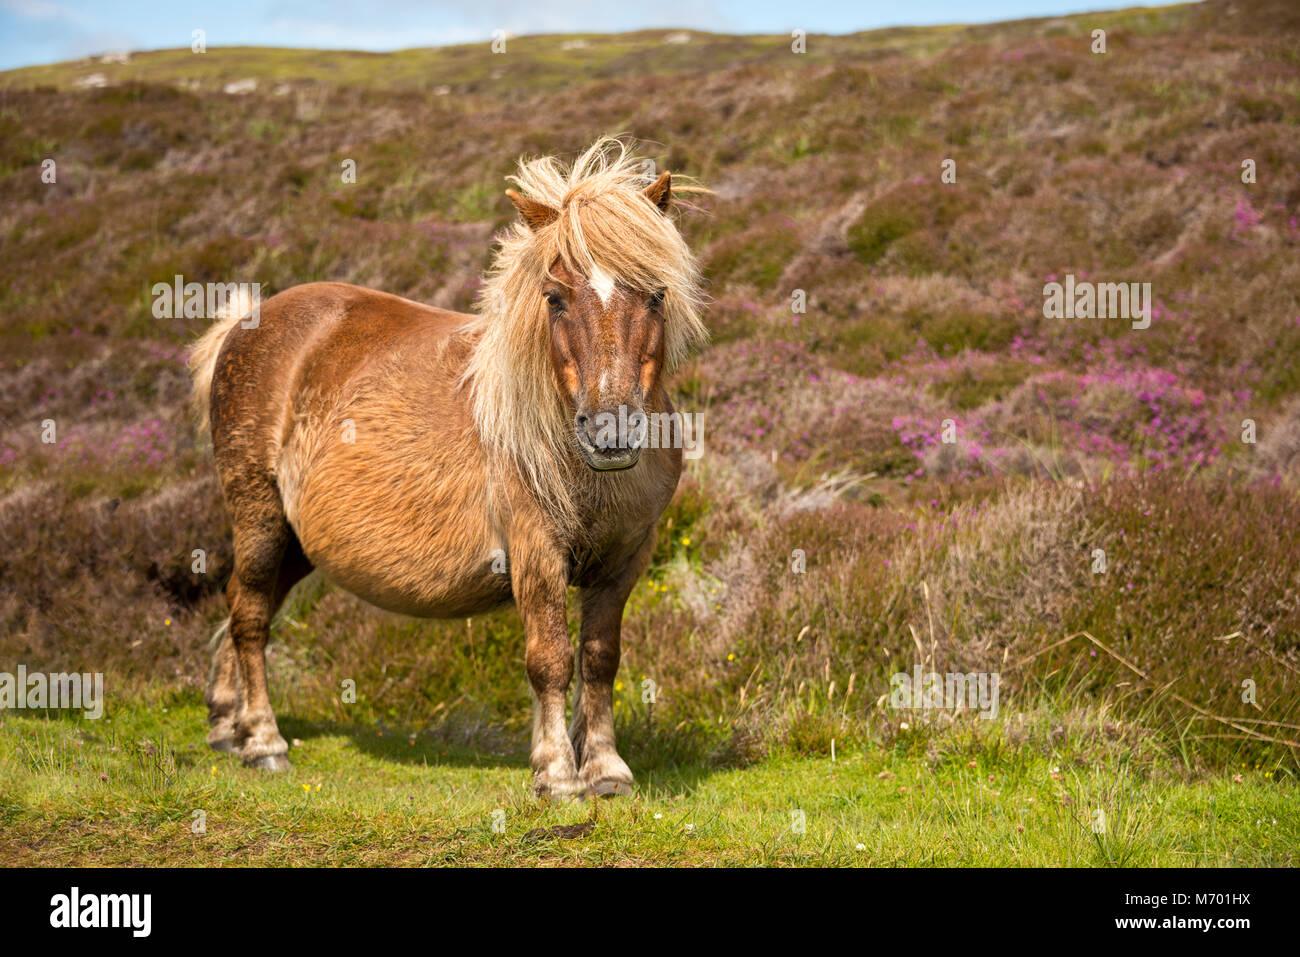 Shetland Pony south Uist Outer Hebrides de Escocia Imagen De Stock